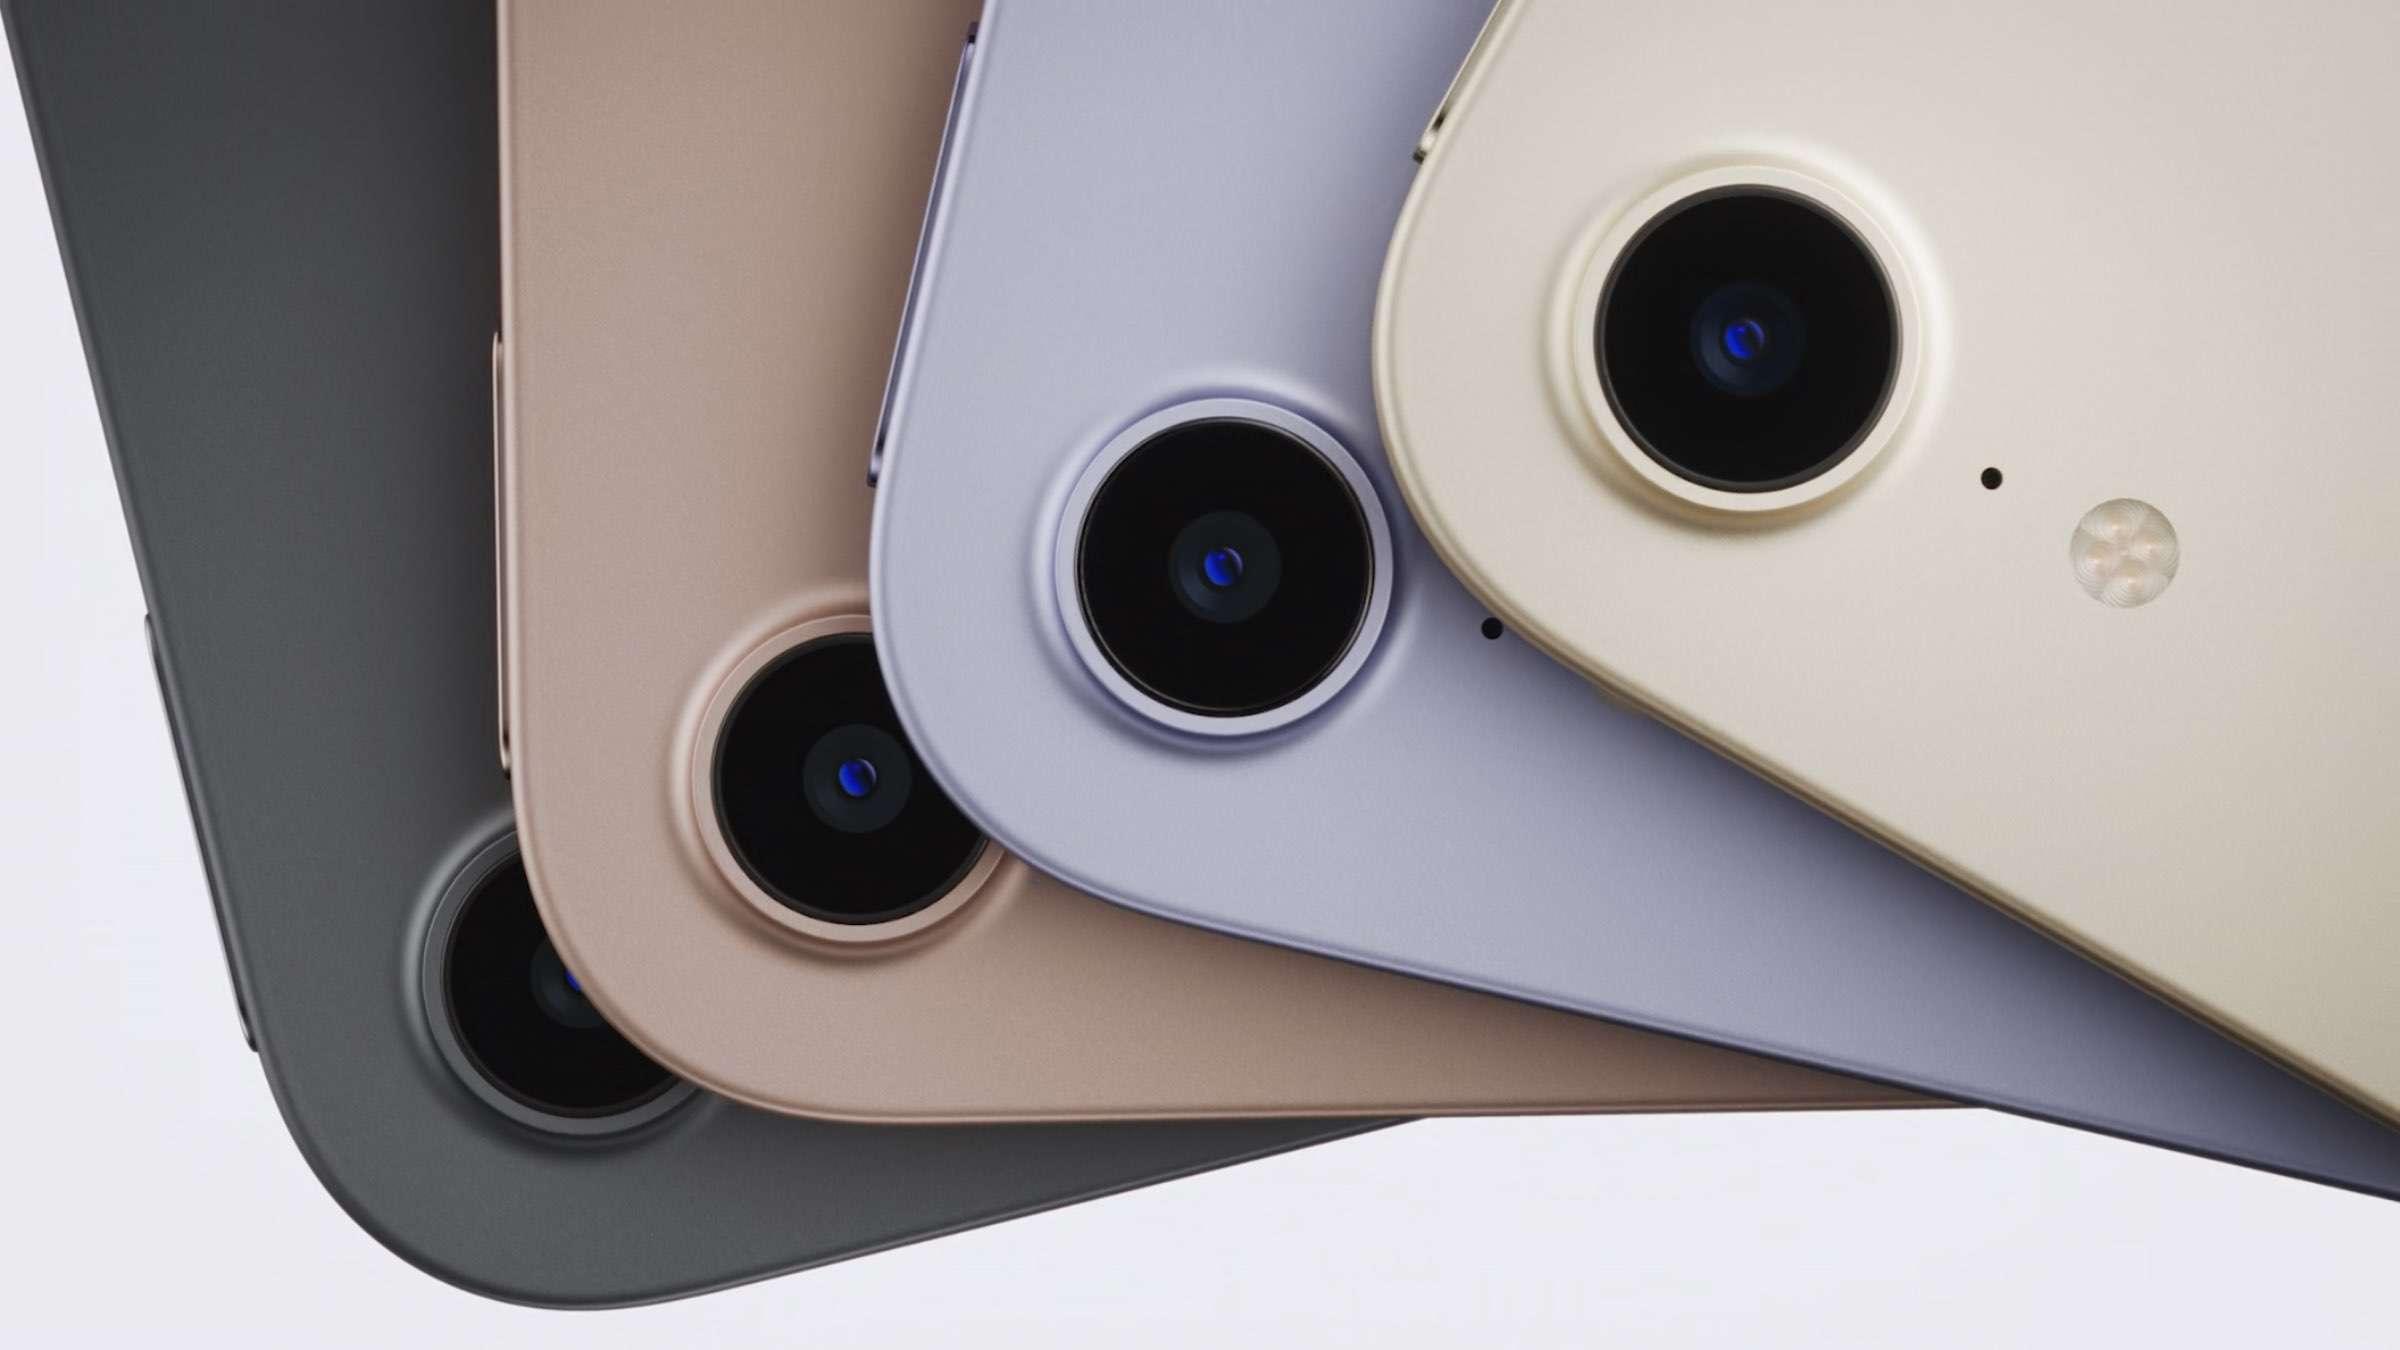 Die neue Kamera im mini